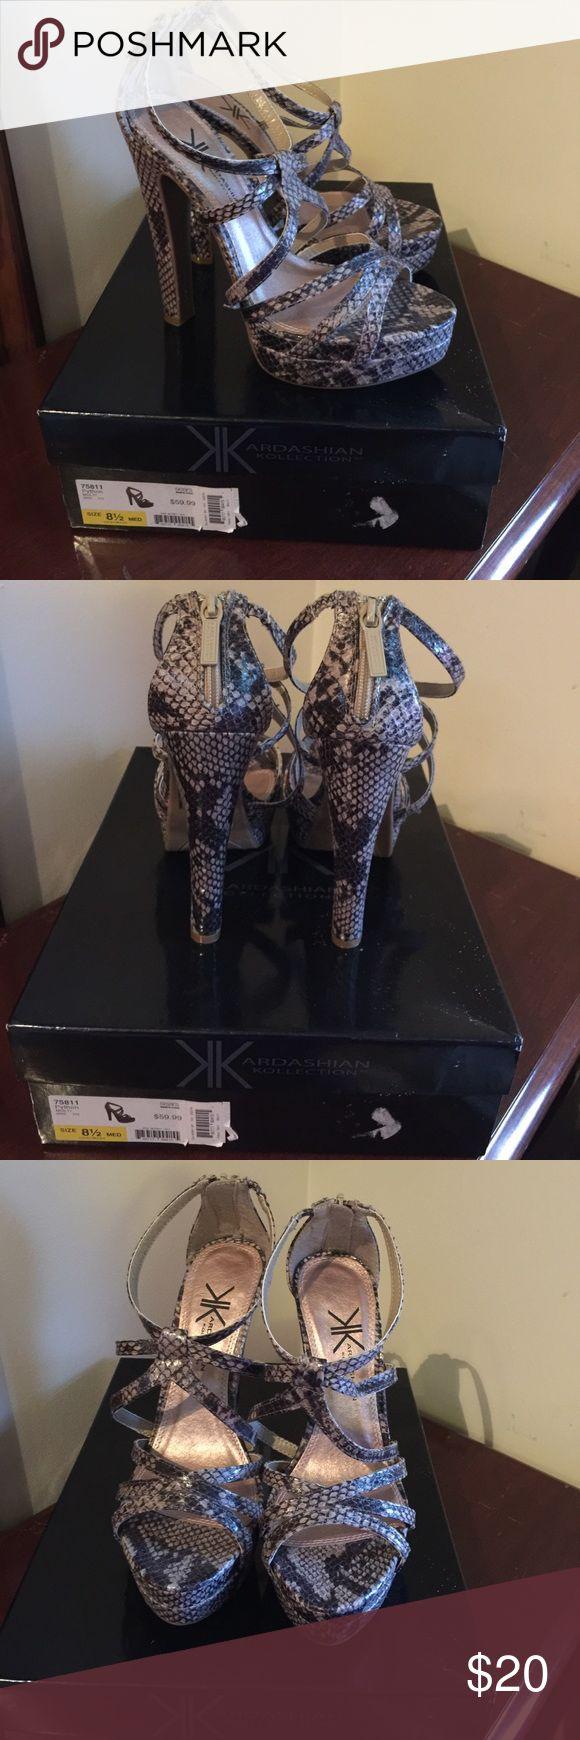 Kardashian Kollection shoes sz 8.5 NWT Kardashian Kollection shoes sz 8.5 NWT never used. They need a new home. Kardashian Kollection Shoes Heels